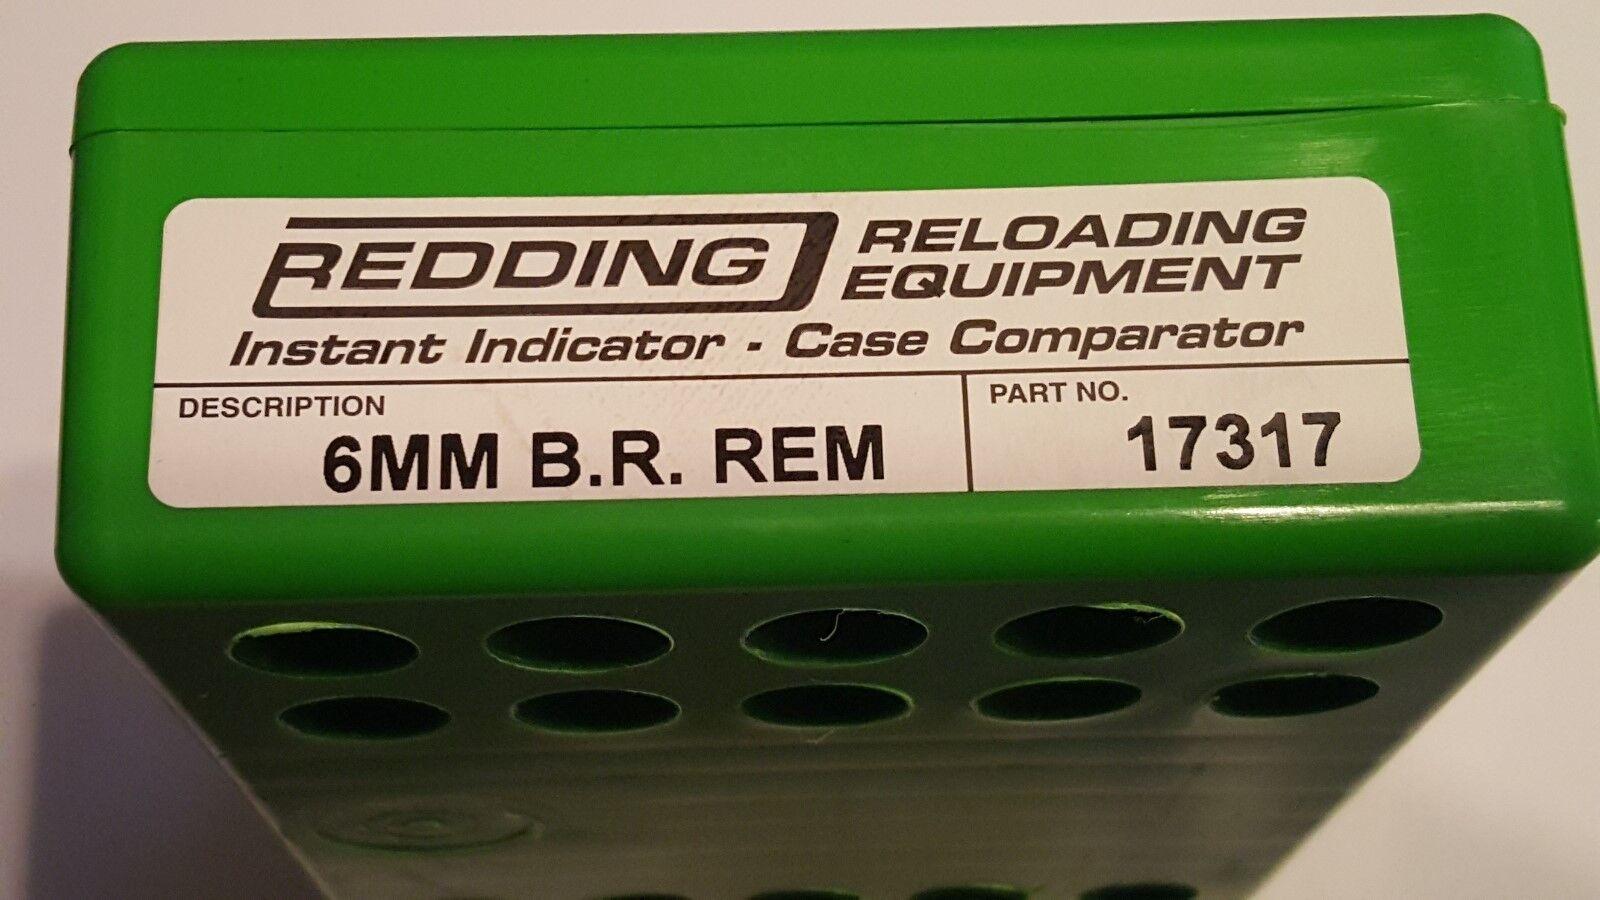 Indicador 17317 rojoDING instantánea con Dial-o 6MM BR REMINGTON-Adaptador de rango Nuevo